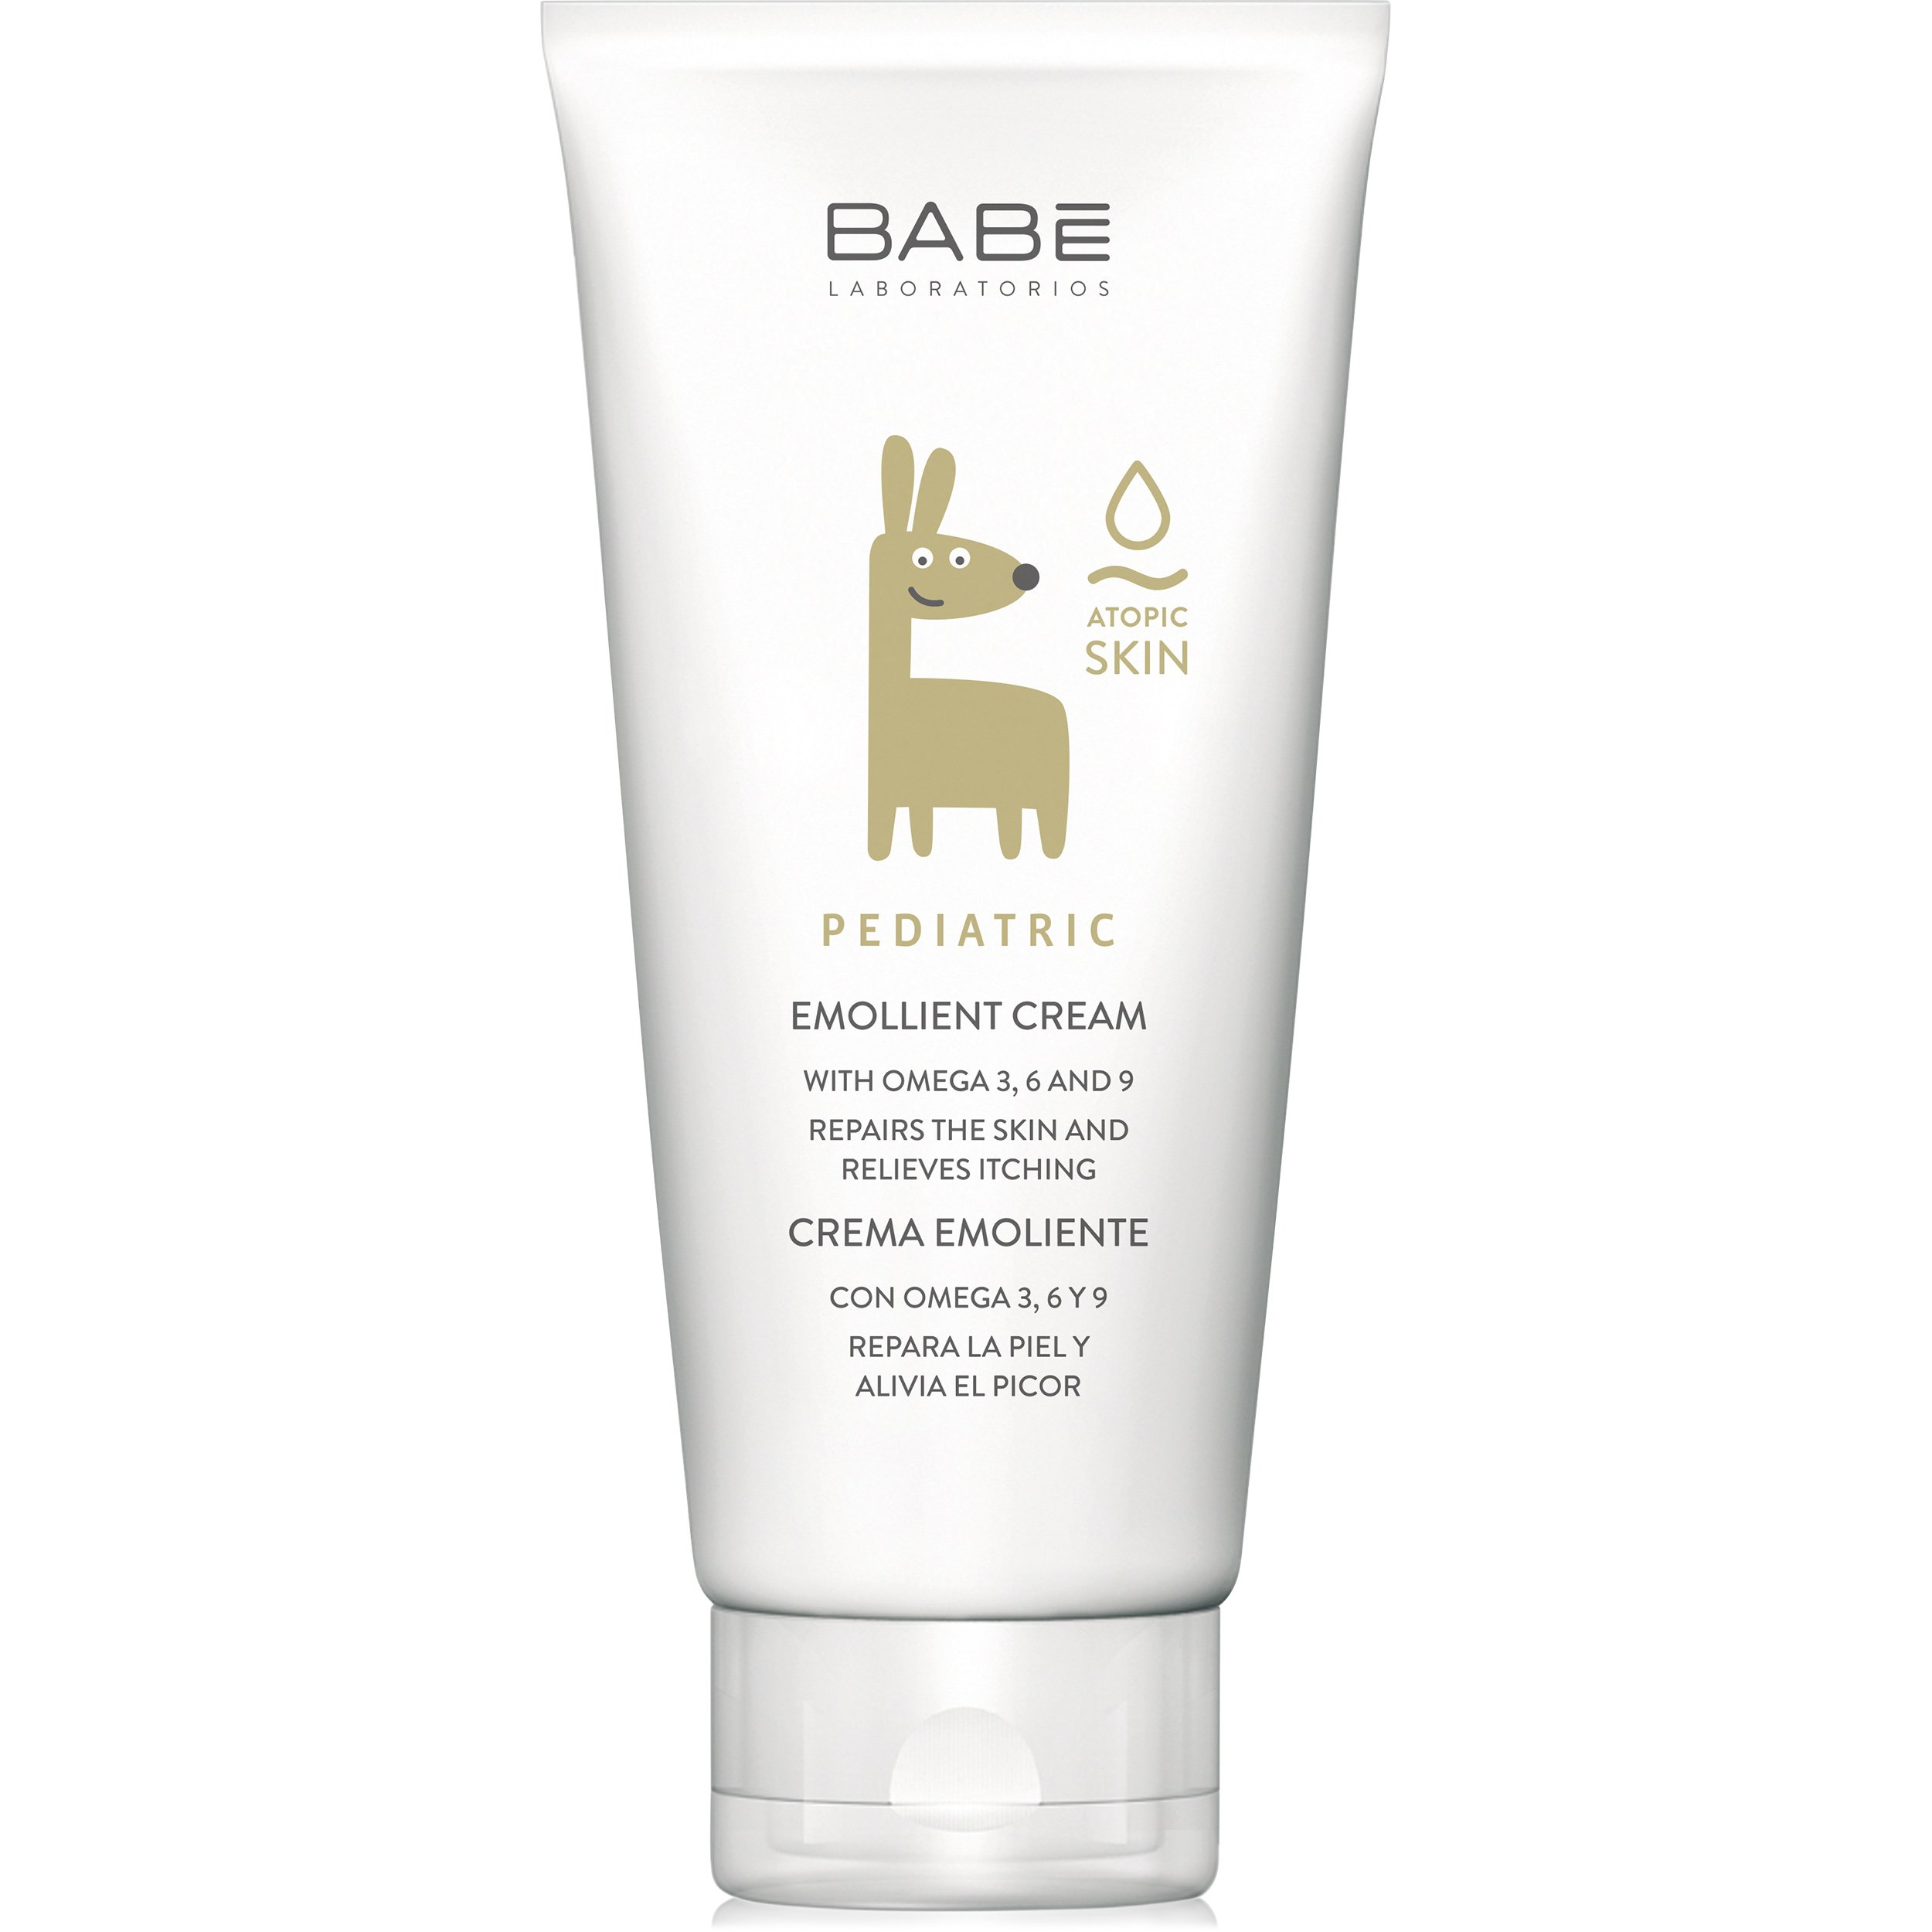 Babe Pediatric Emollient Cream Ενυδατική Κρέμα, Παρέχει Βαθιά Θρέψη στην Ξηρή, Ατοπική Επιδερμίδα των Βρεφών & των Παιδιών 200ml